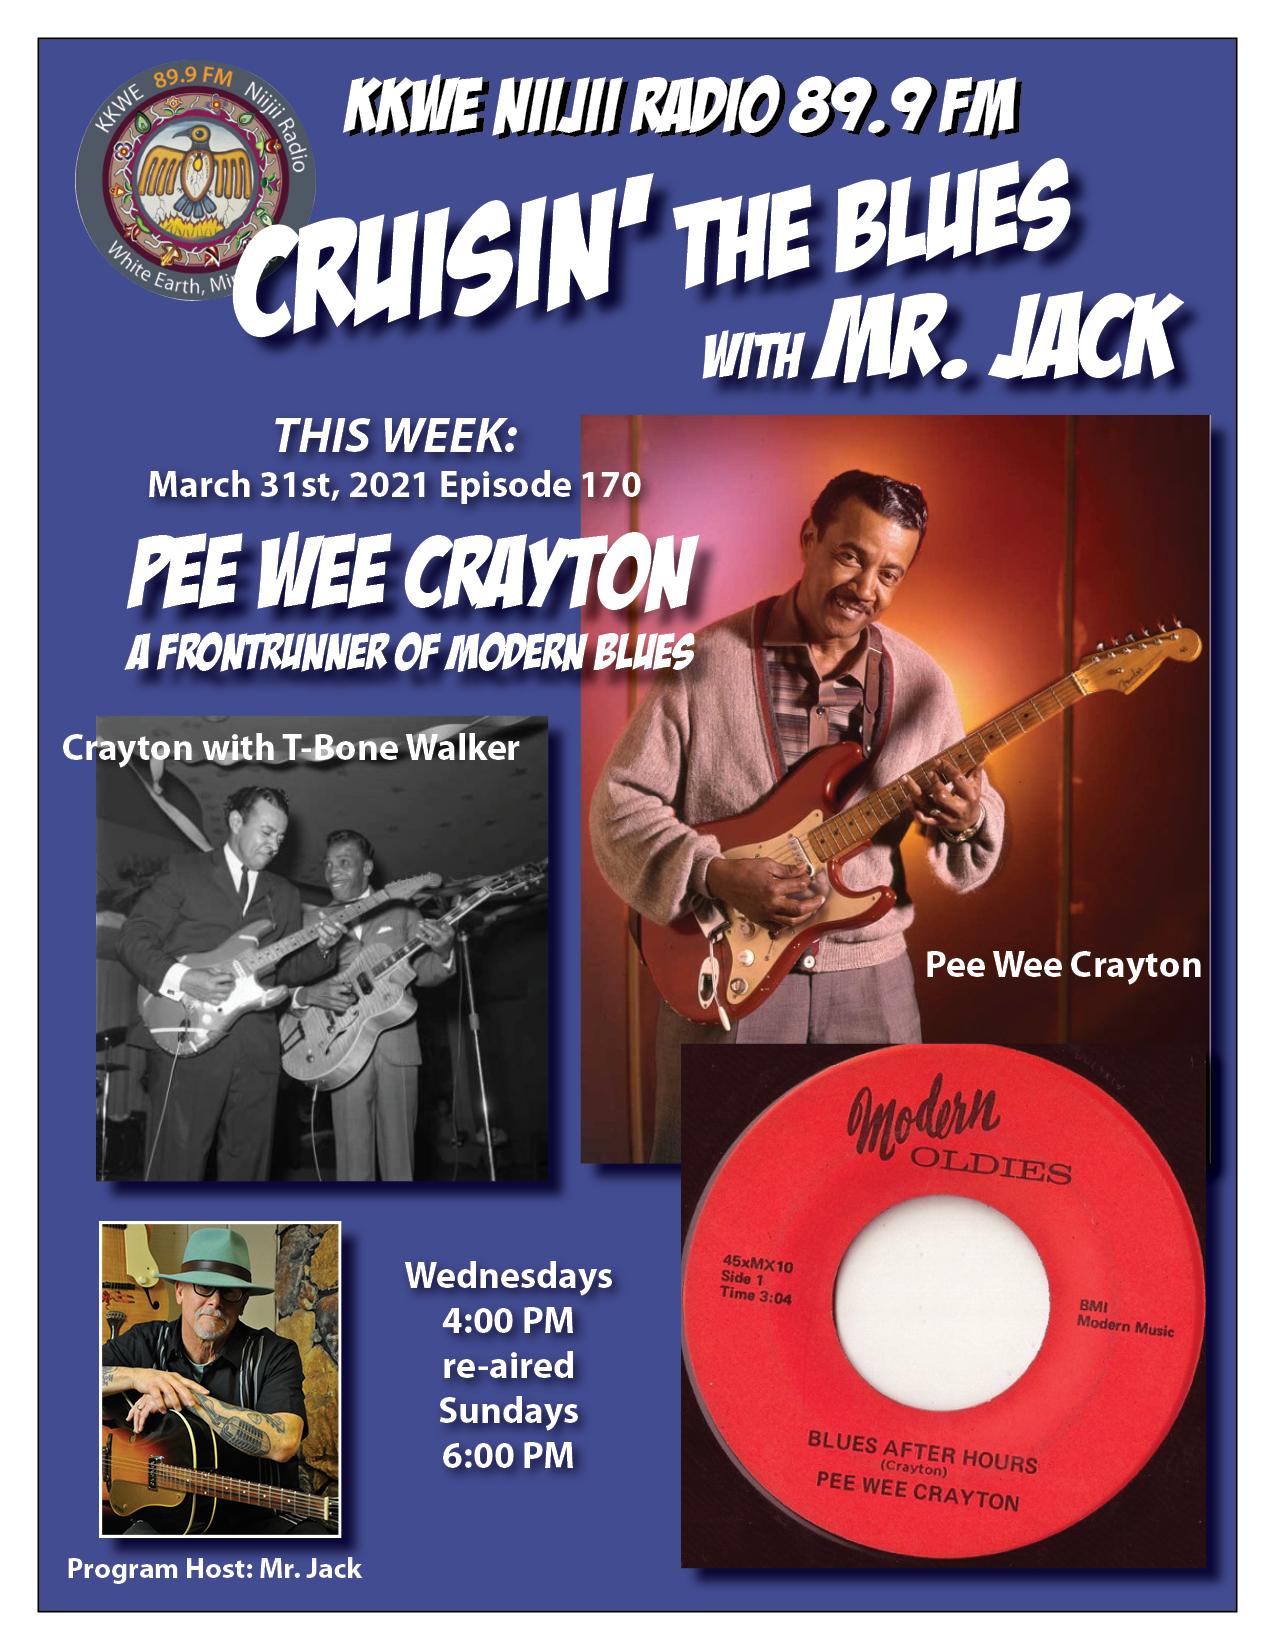 EP170 Pee Wee Crayton